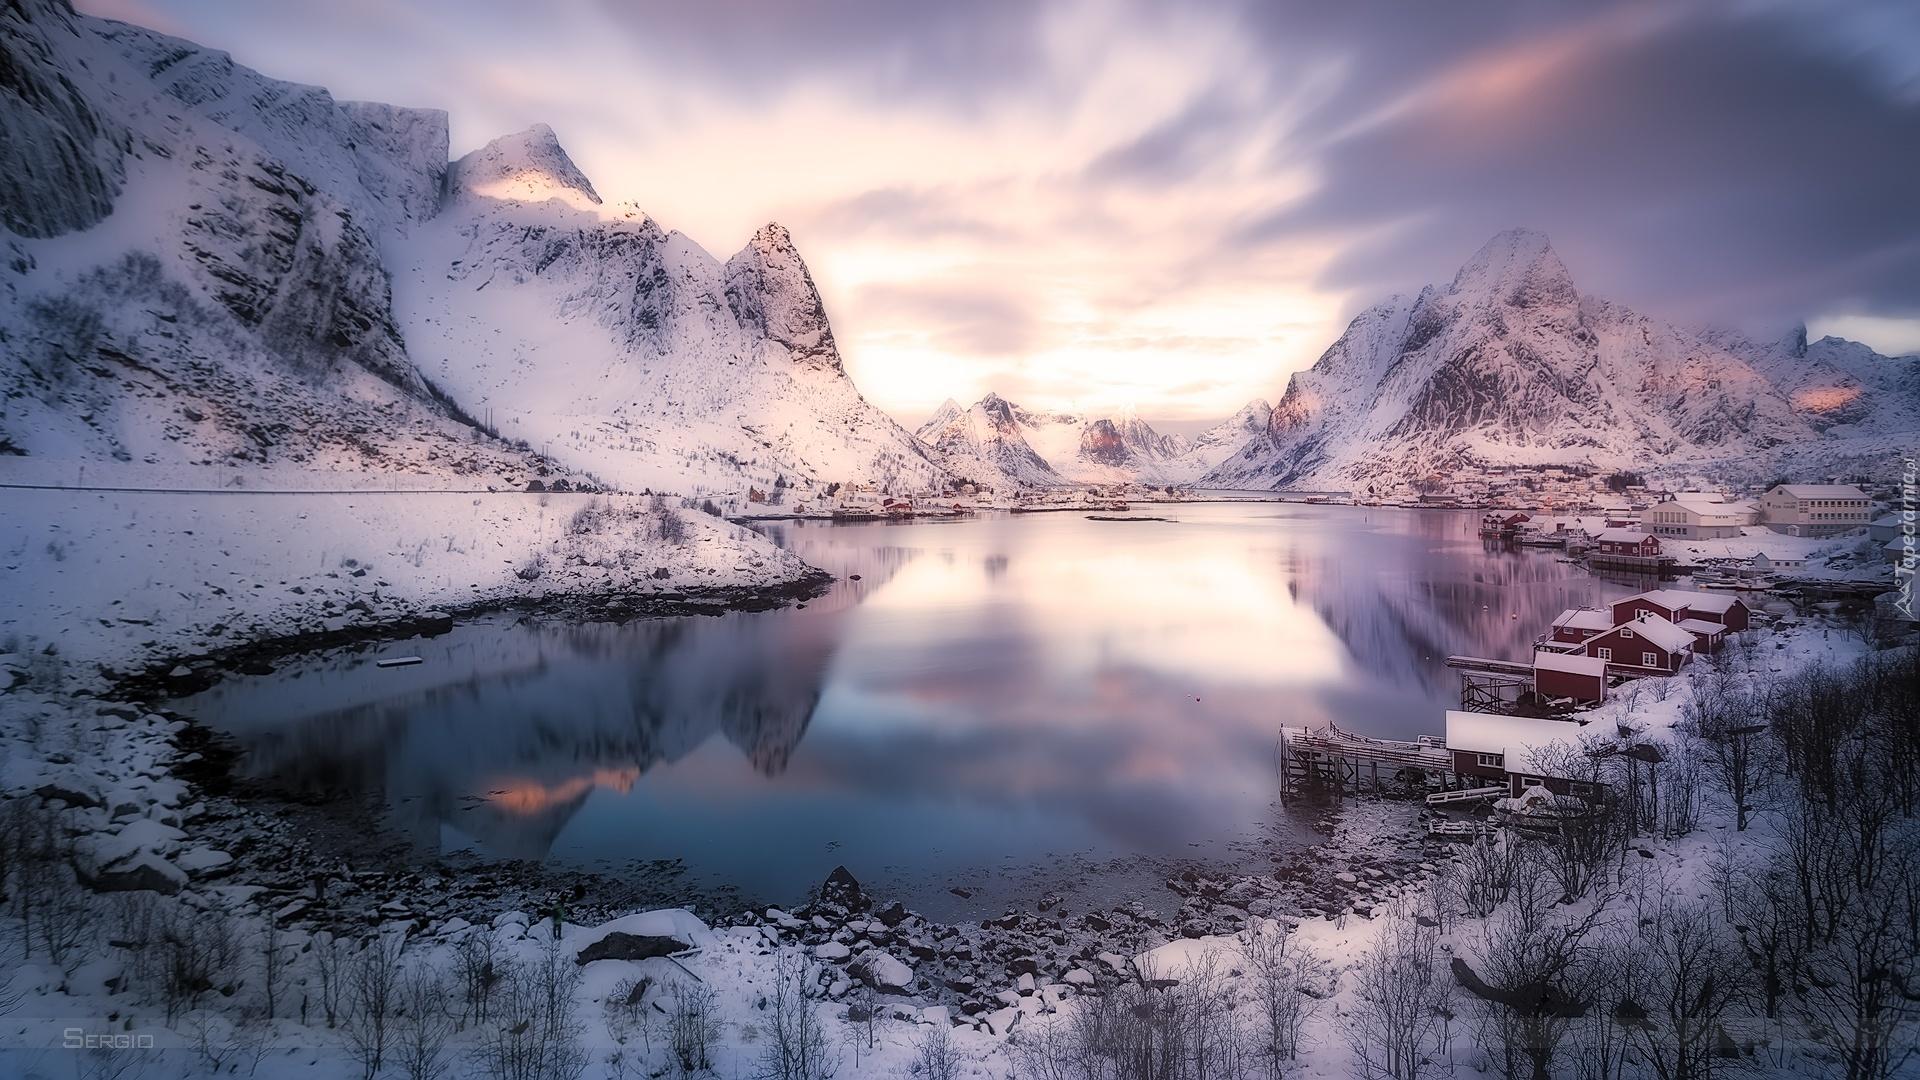 Fondo Escritorio Paisaje Bonita Nevada: Góry, Jezioro, Śnieg